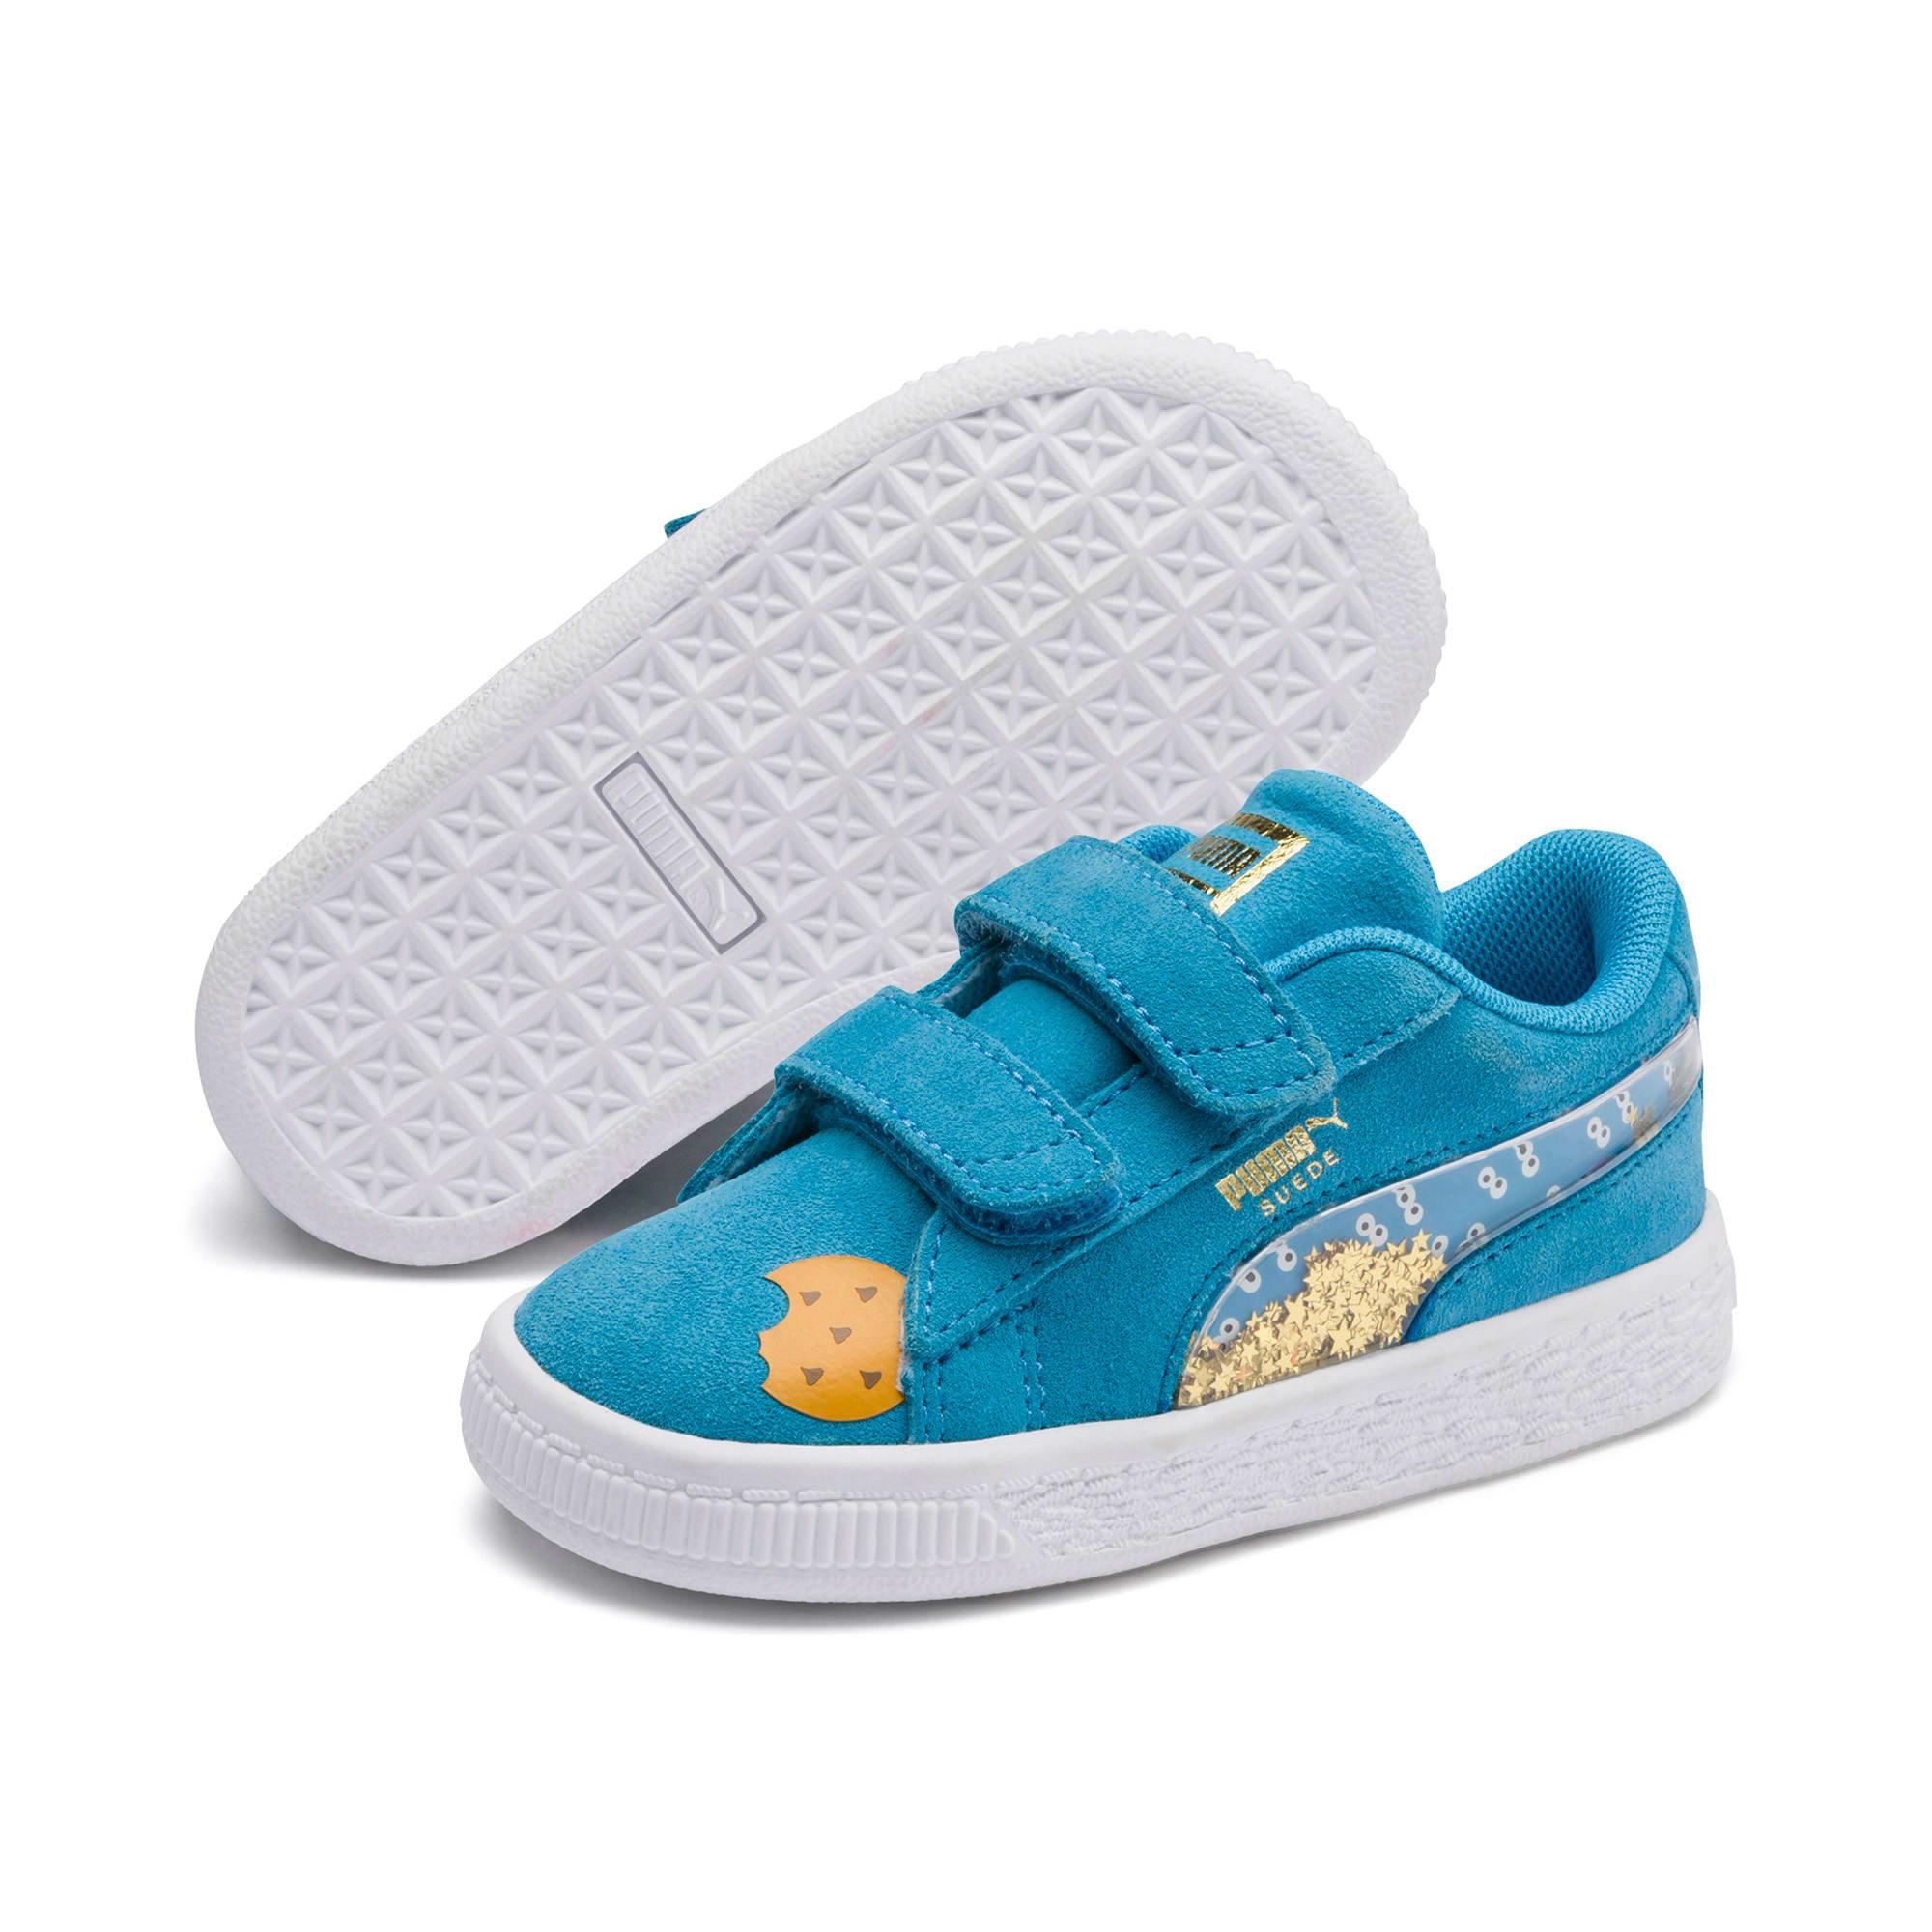 Thumbnail 2 of PUMA x SESAME STREET 50 Suede Statement Toddler Shoes, Bleu Azur-Puma White, medium